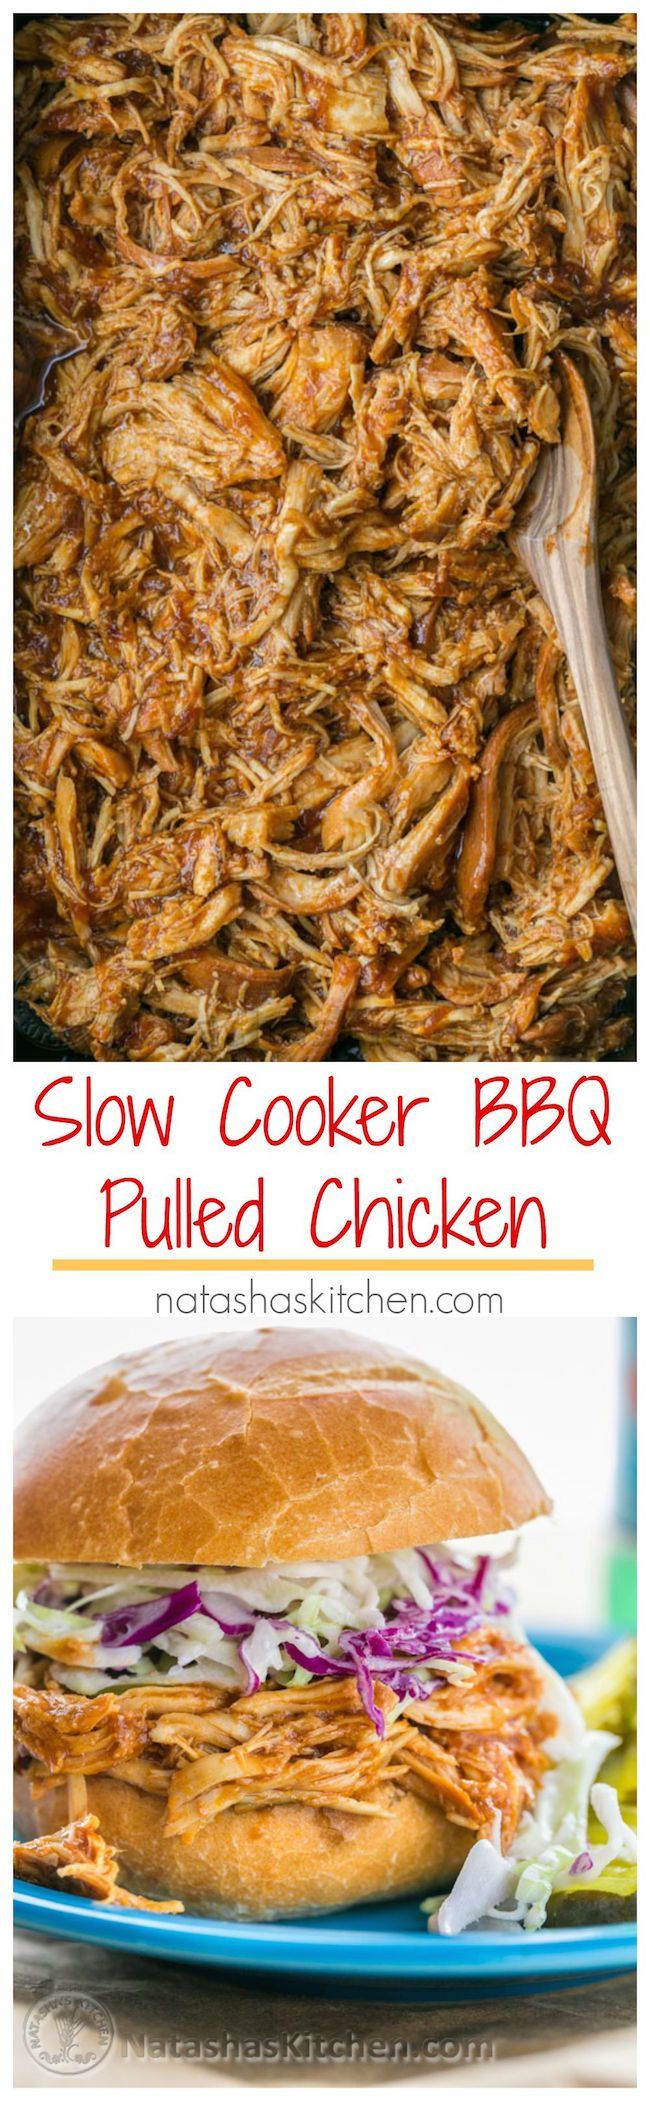 Slow Cooker Bbq Chicken Food Crockpot Freezer Meals Food Recipes Slow Cooker Bbq Crockpot